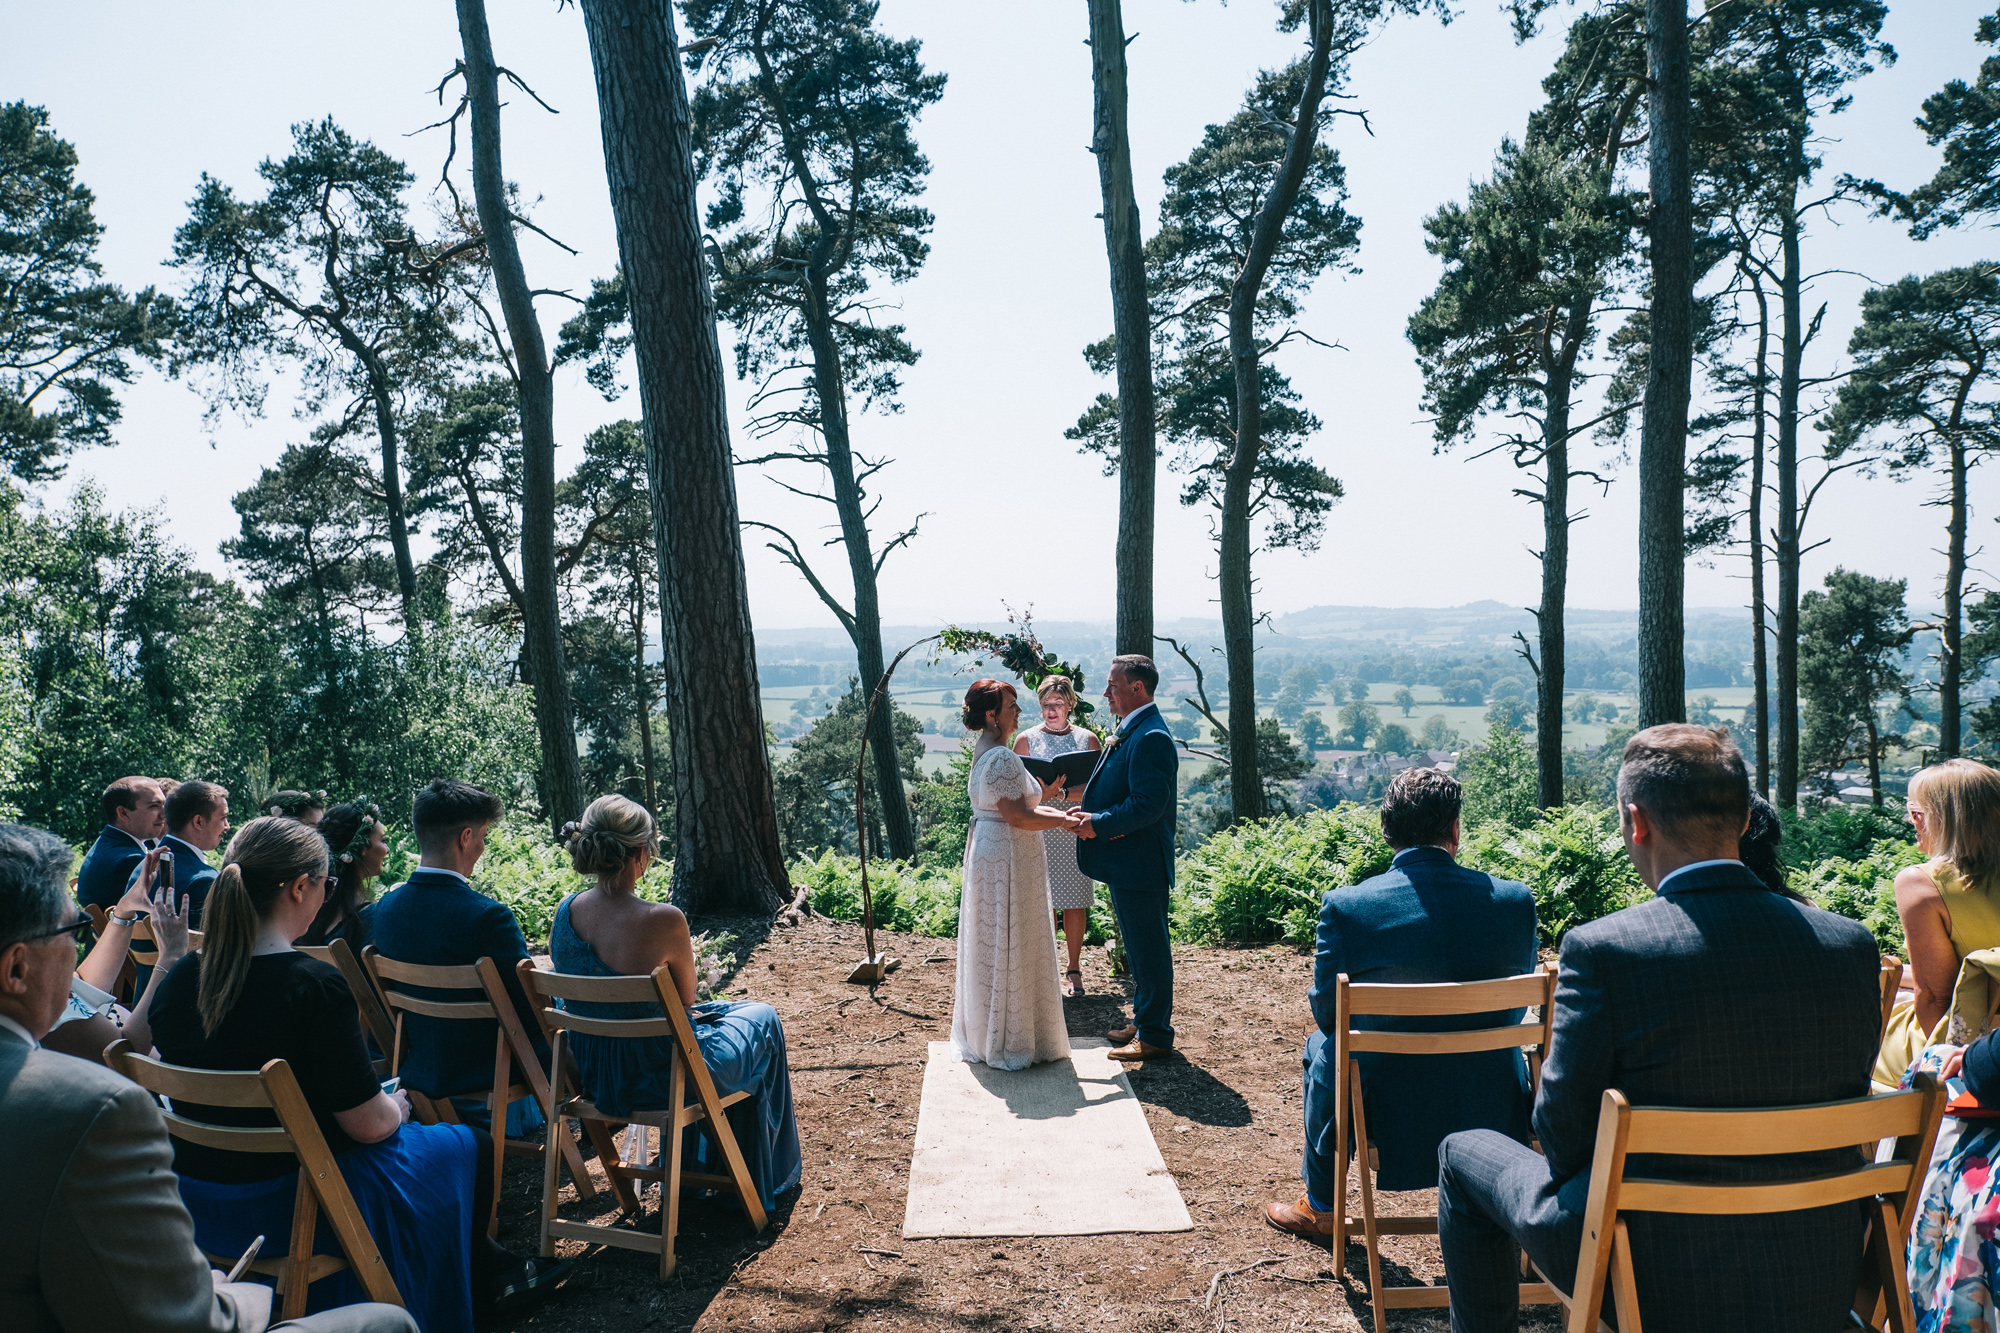 Bridgette-Dahlia-Blush-Silk-Lace-Wedding-Dress-Kate-Beaumont-Sheffield-Ivory-Fayre-8.jpg